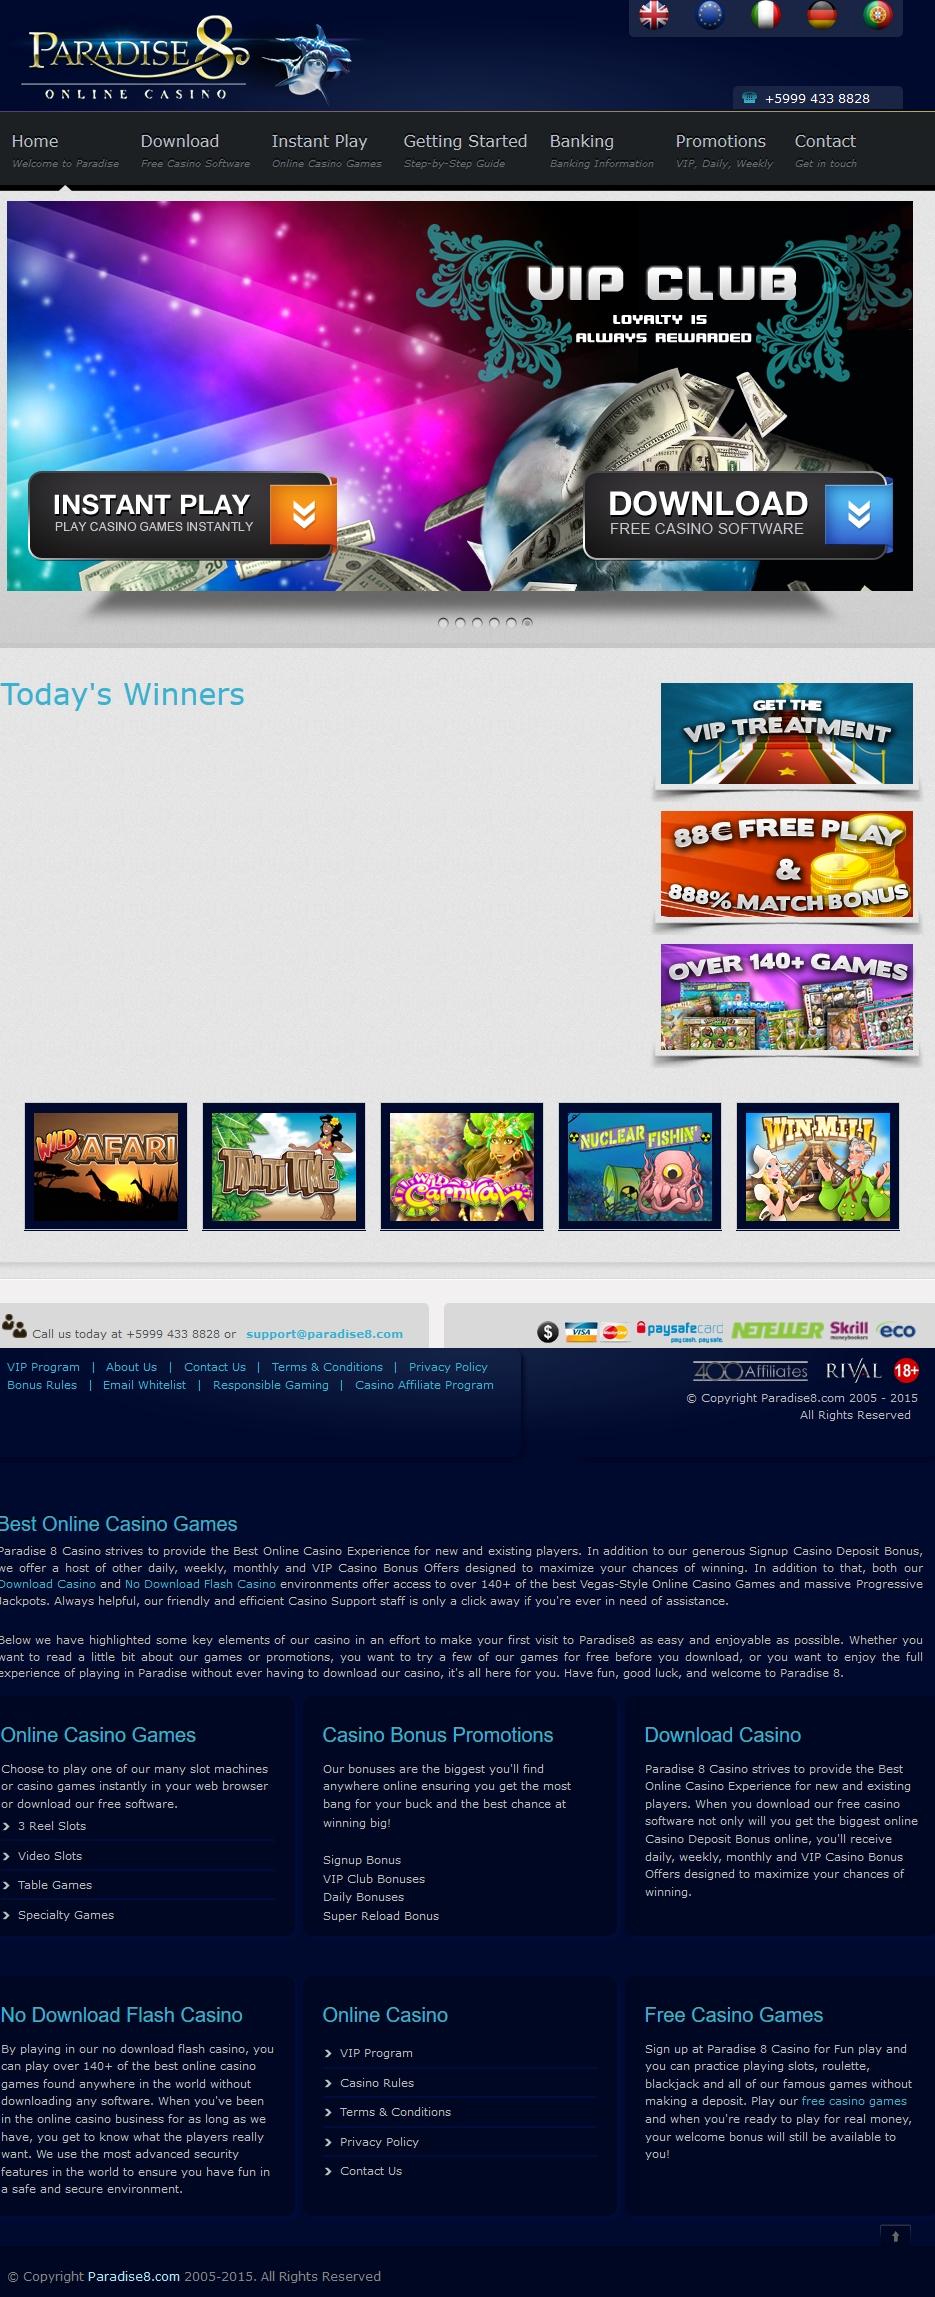 Treasure Island Jackpots (Sloto Cash Mirror)的EUR 110赌场筹码